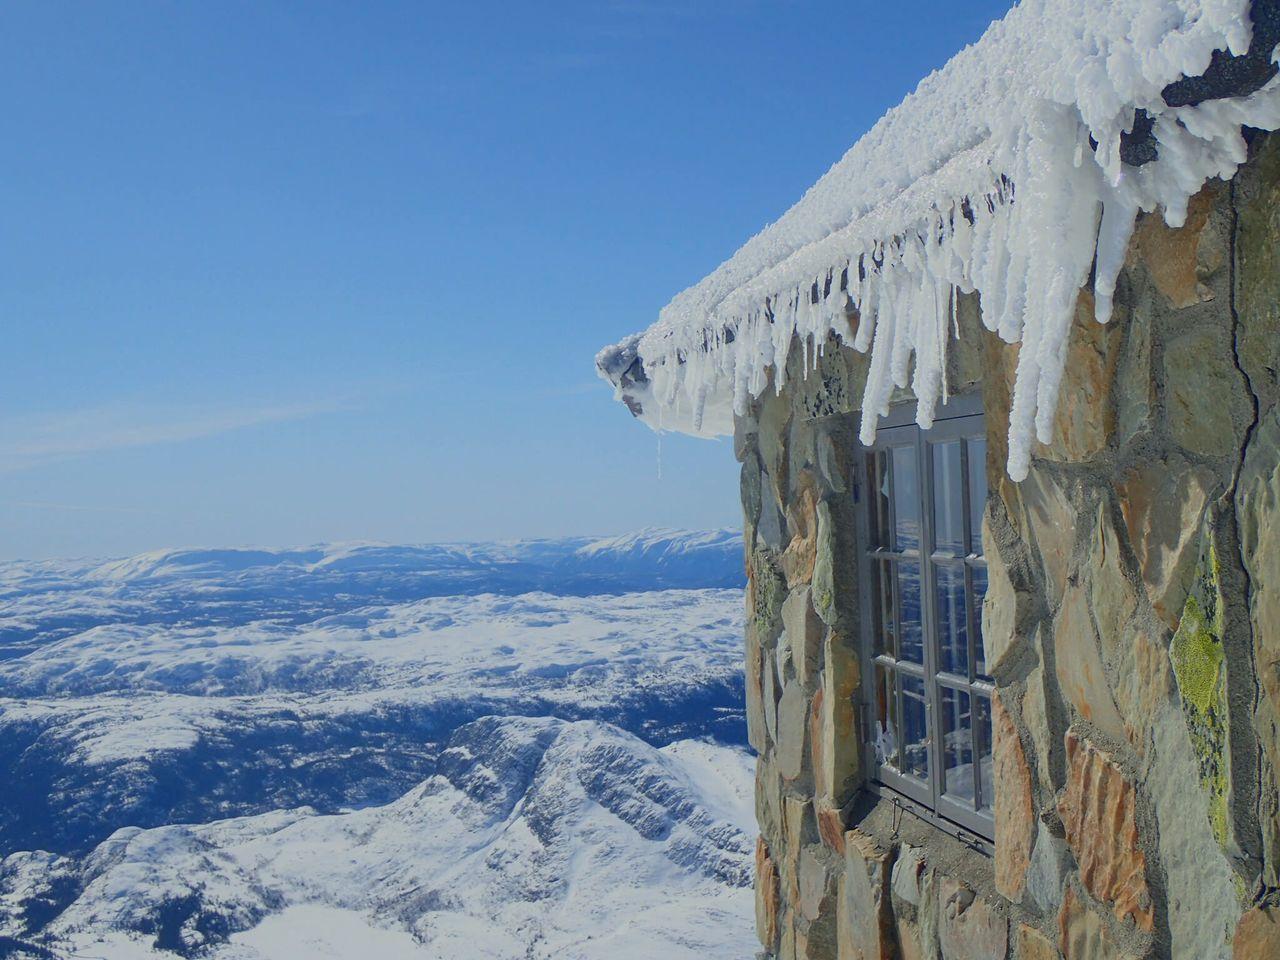 🌞🌞🌞🌞🌞whAt a fridaY🌞🌞🌞🌞🌞Gaustatoppen, Norway Gaustatoppen Telemark Visittelemark Whataview Backcountryskiing Helloworld HelloApril Iloveskiing Topptur Ilovenorway Enjoying Life Onthetopoftheworld Damgooddays Springtime